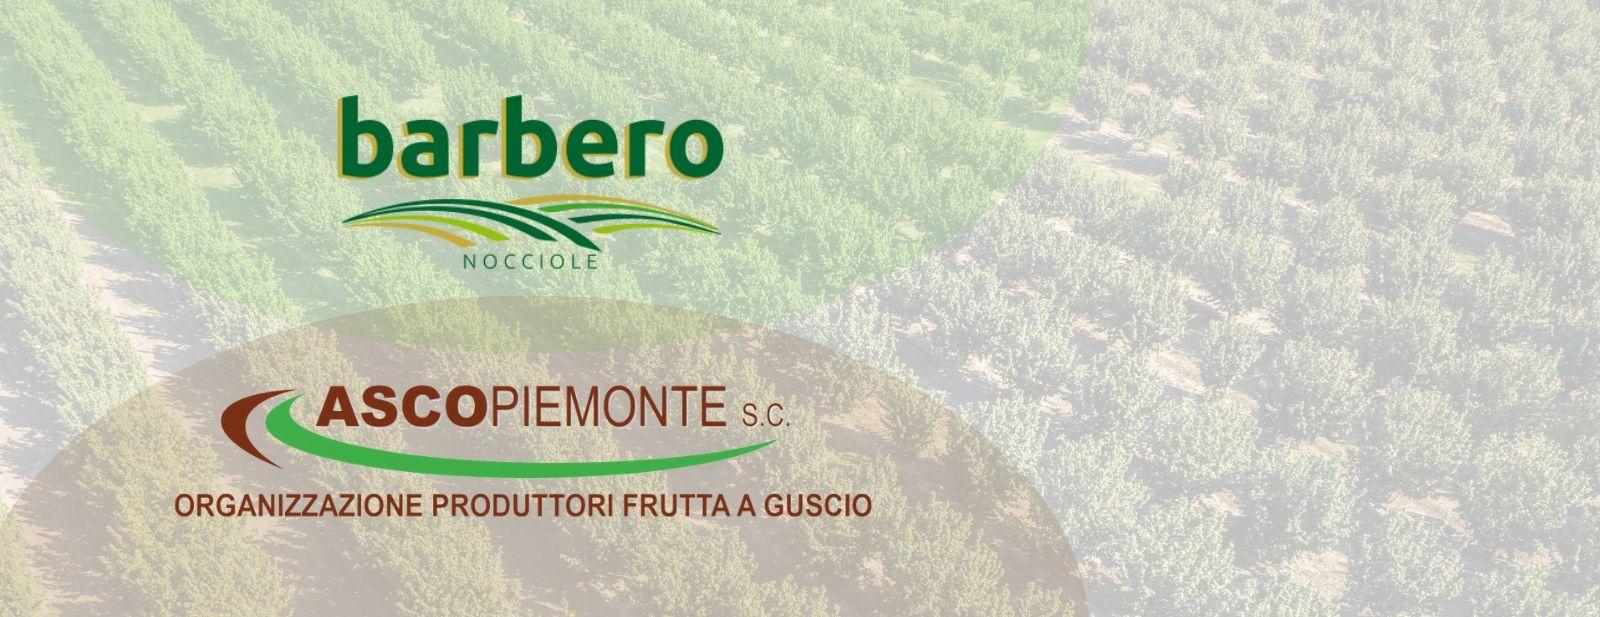 Partnership strategia: Ascopiemonte e Barbero